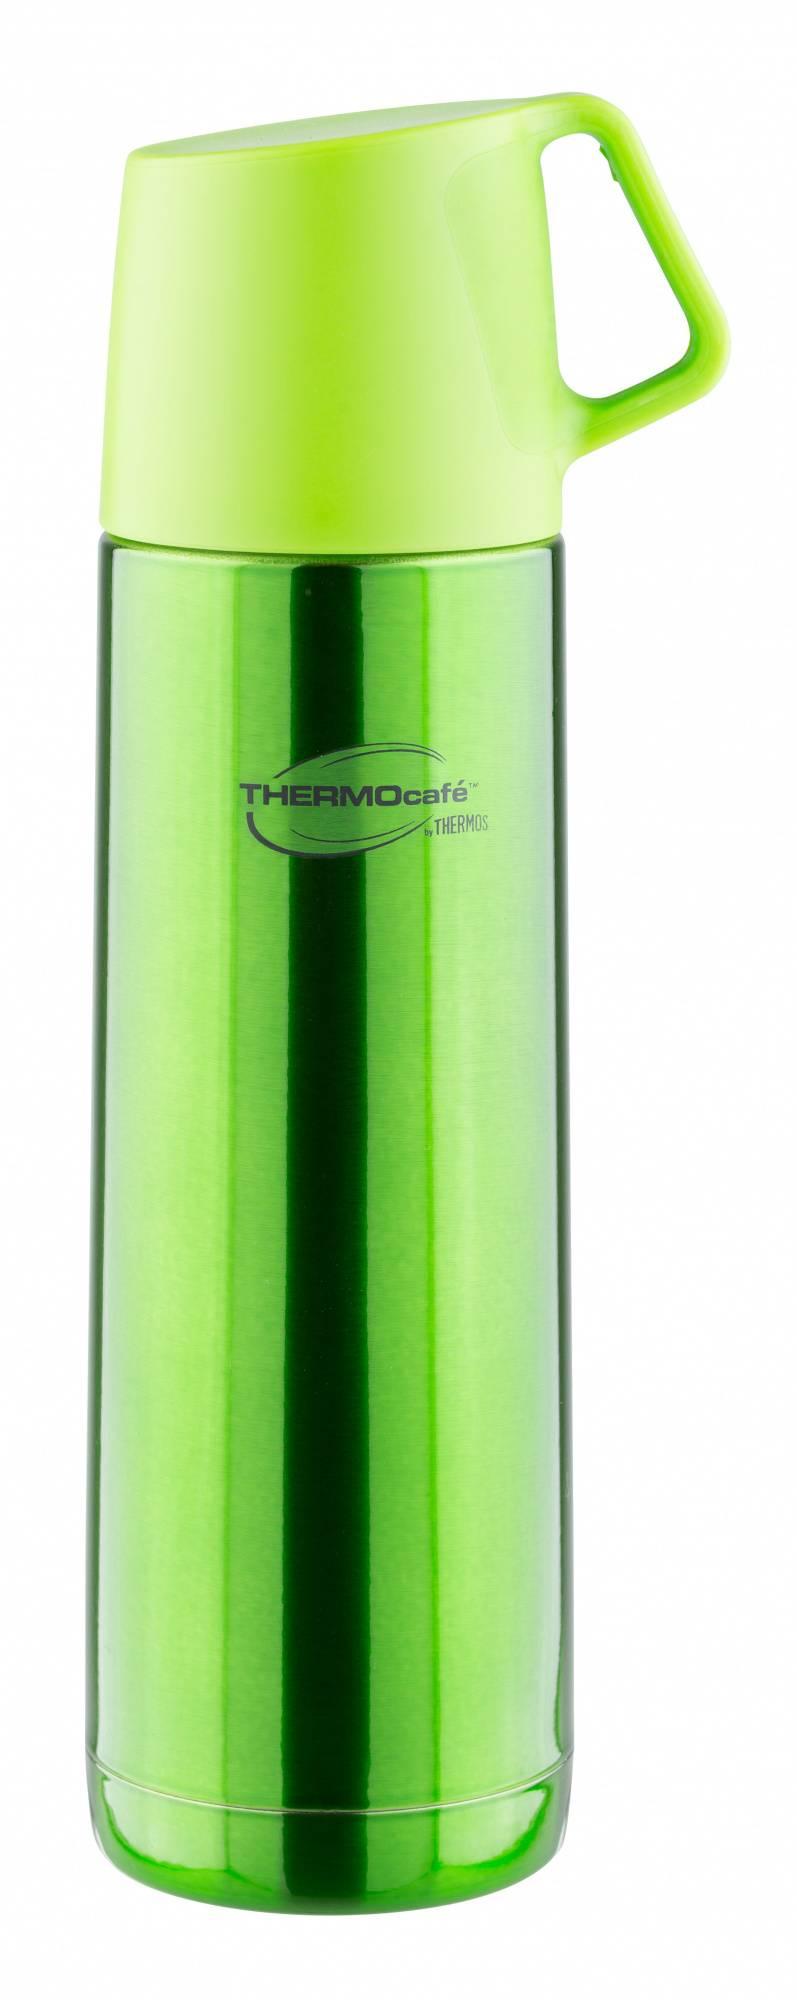 Термос Thermos THERMOcafe JF-500 салатовый - фото 1